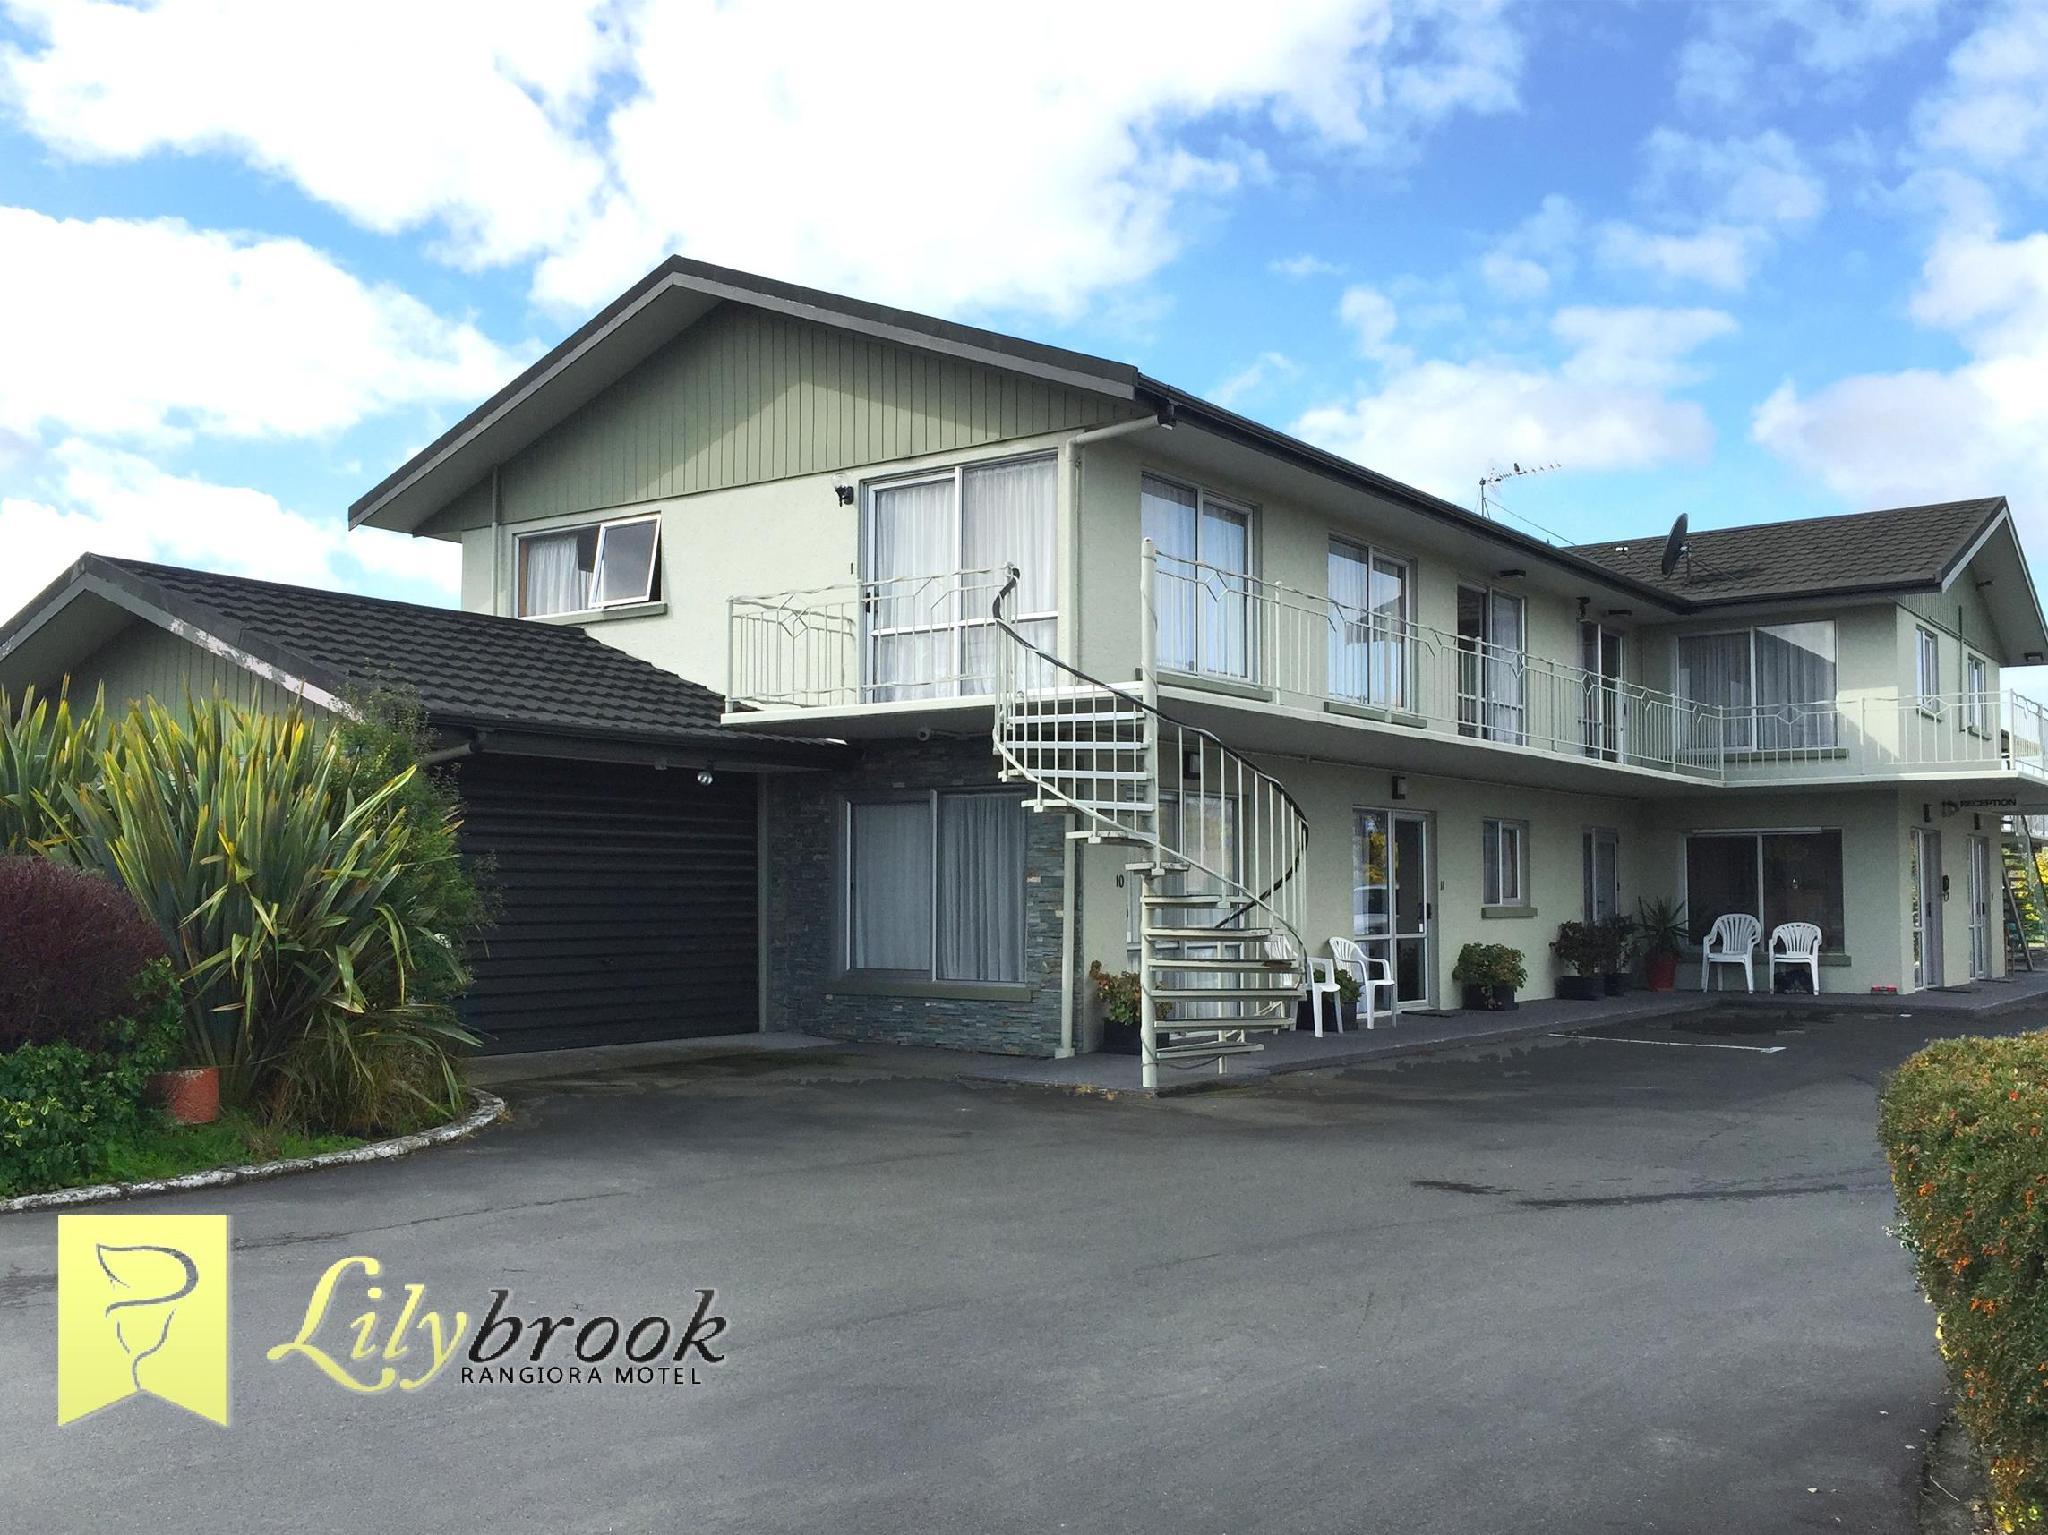 Lilybrook Motel, Waimakariri